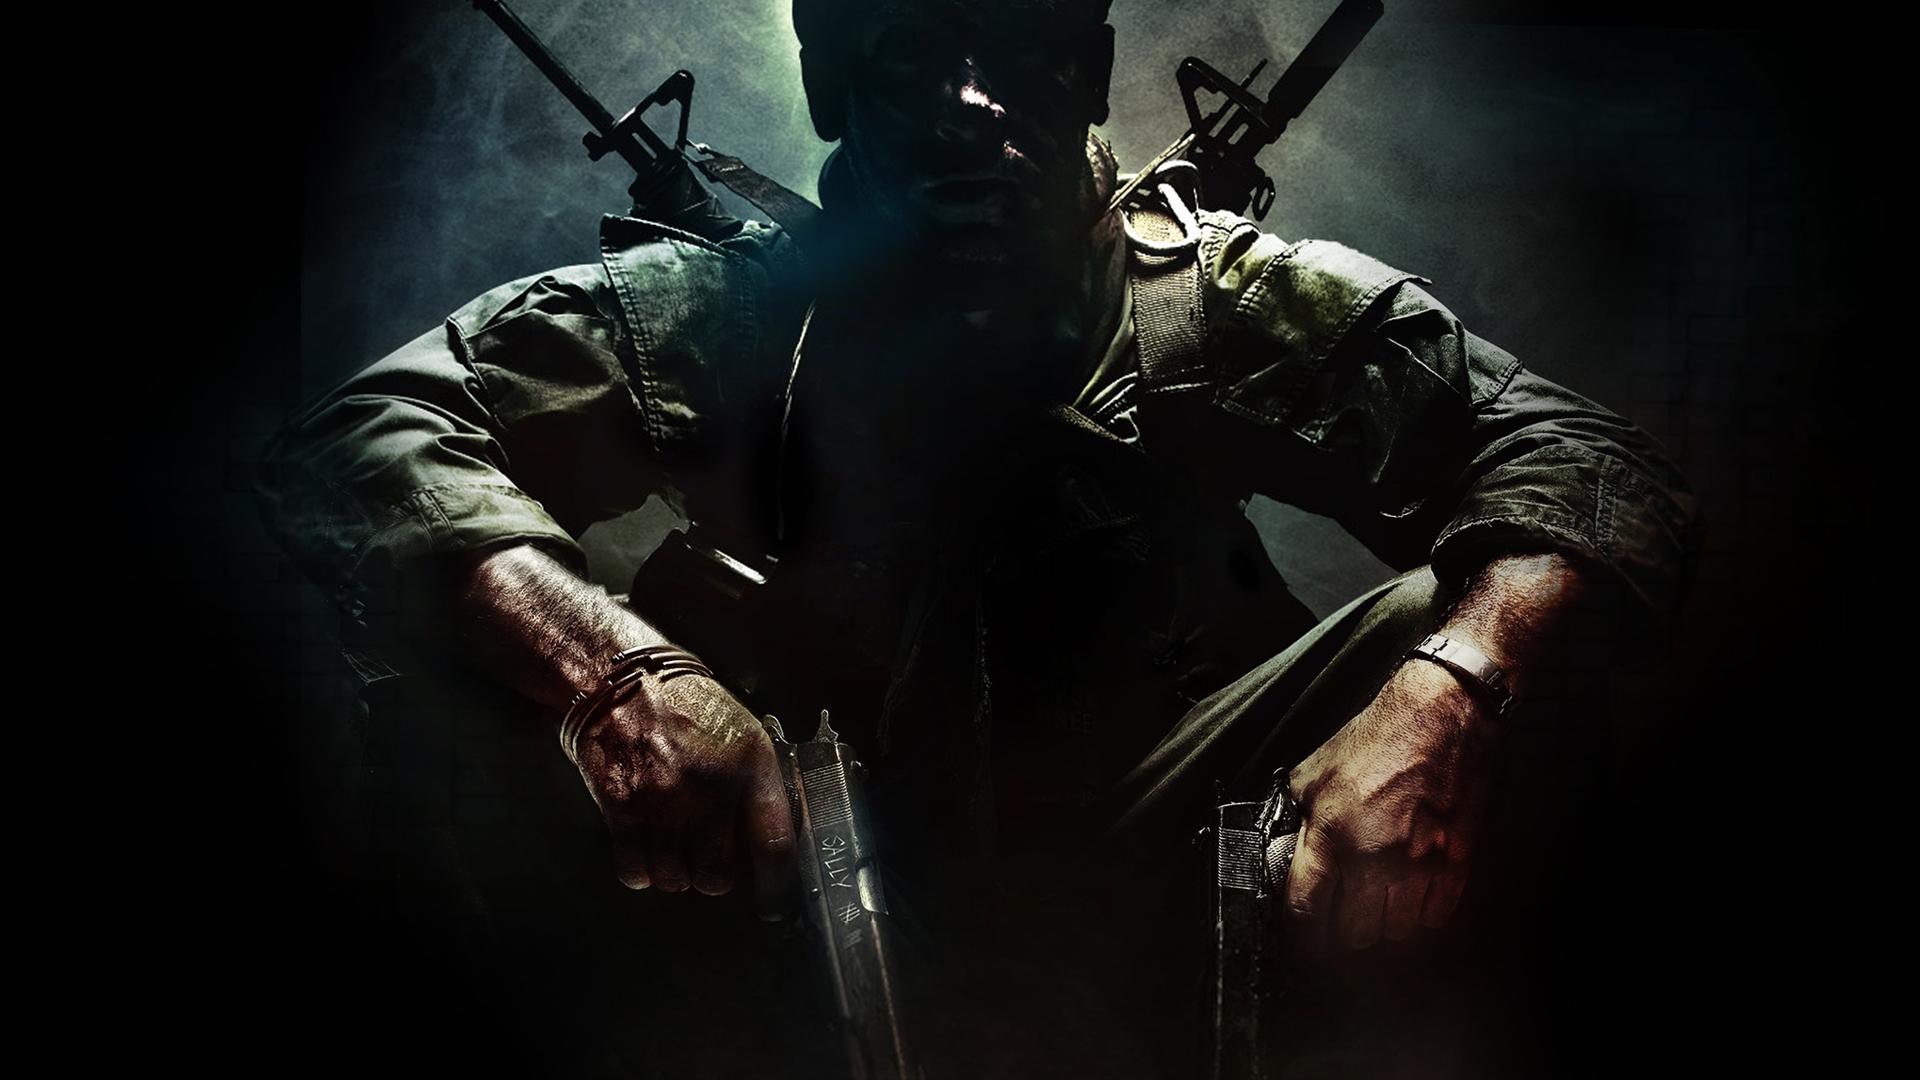 Call Of Duty Black Ops Wallpaper 1080P wallpaper   766827 1920x1080